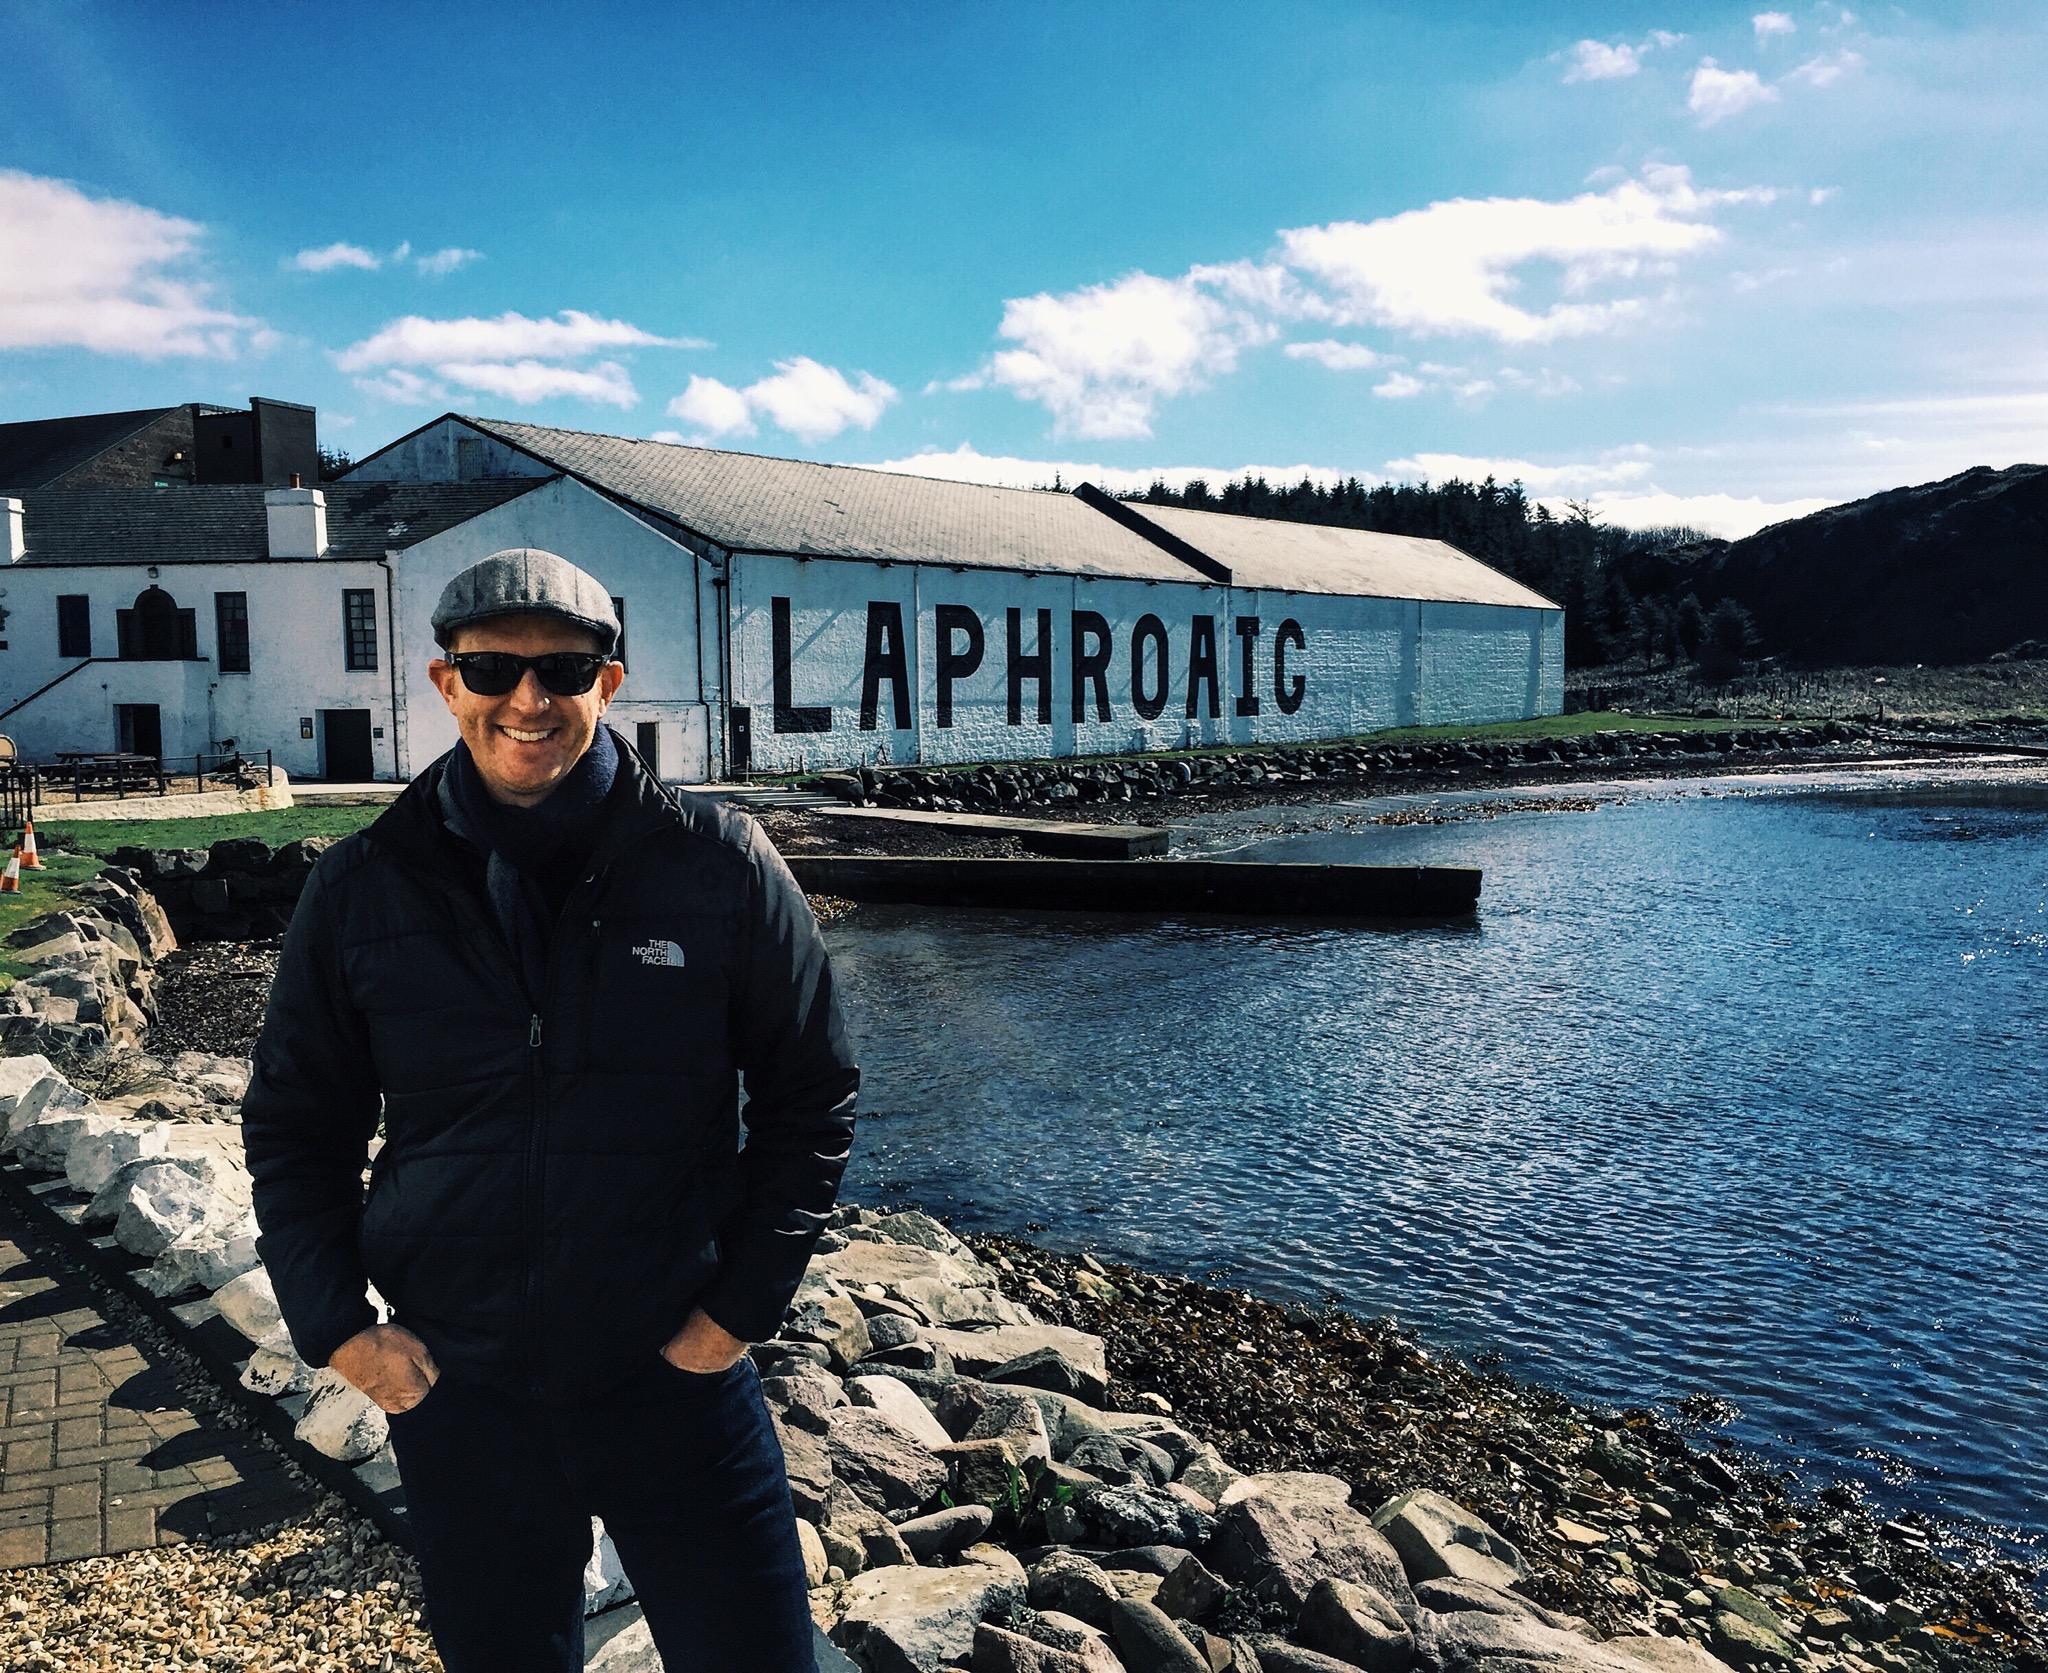 Me at Laphoraig